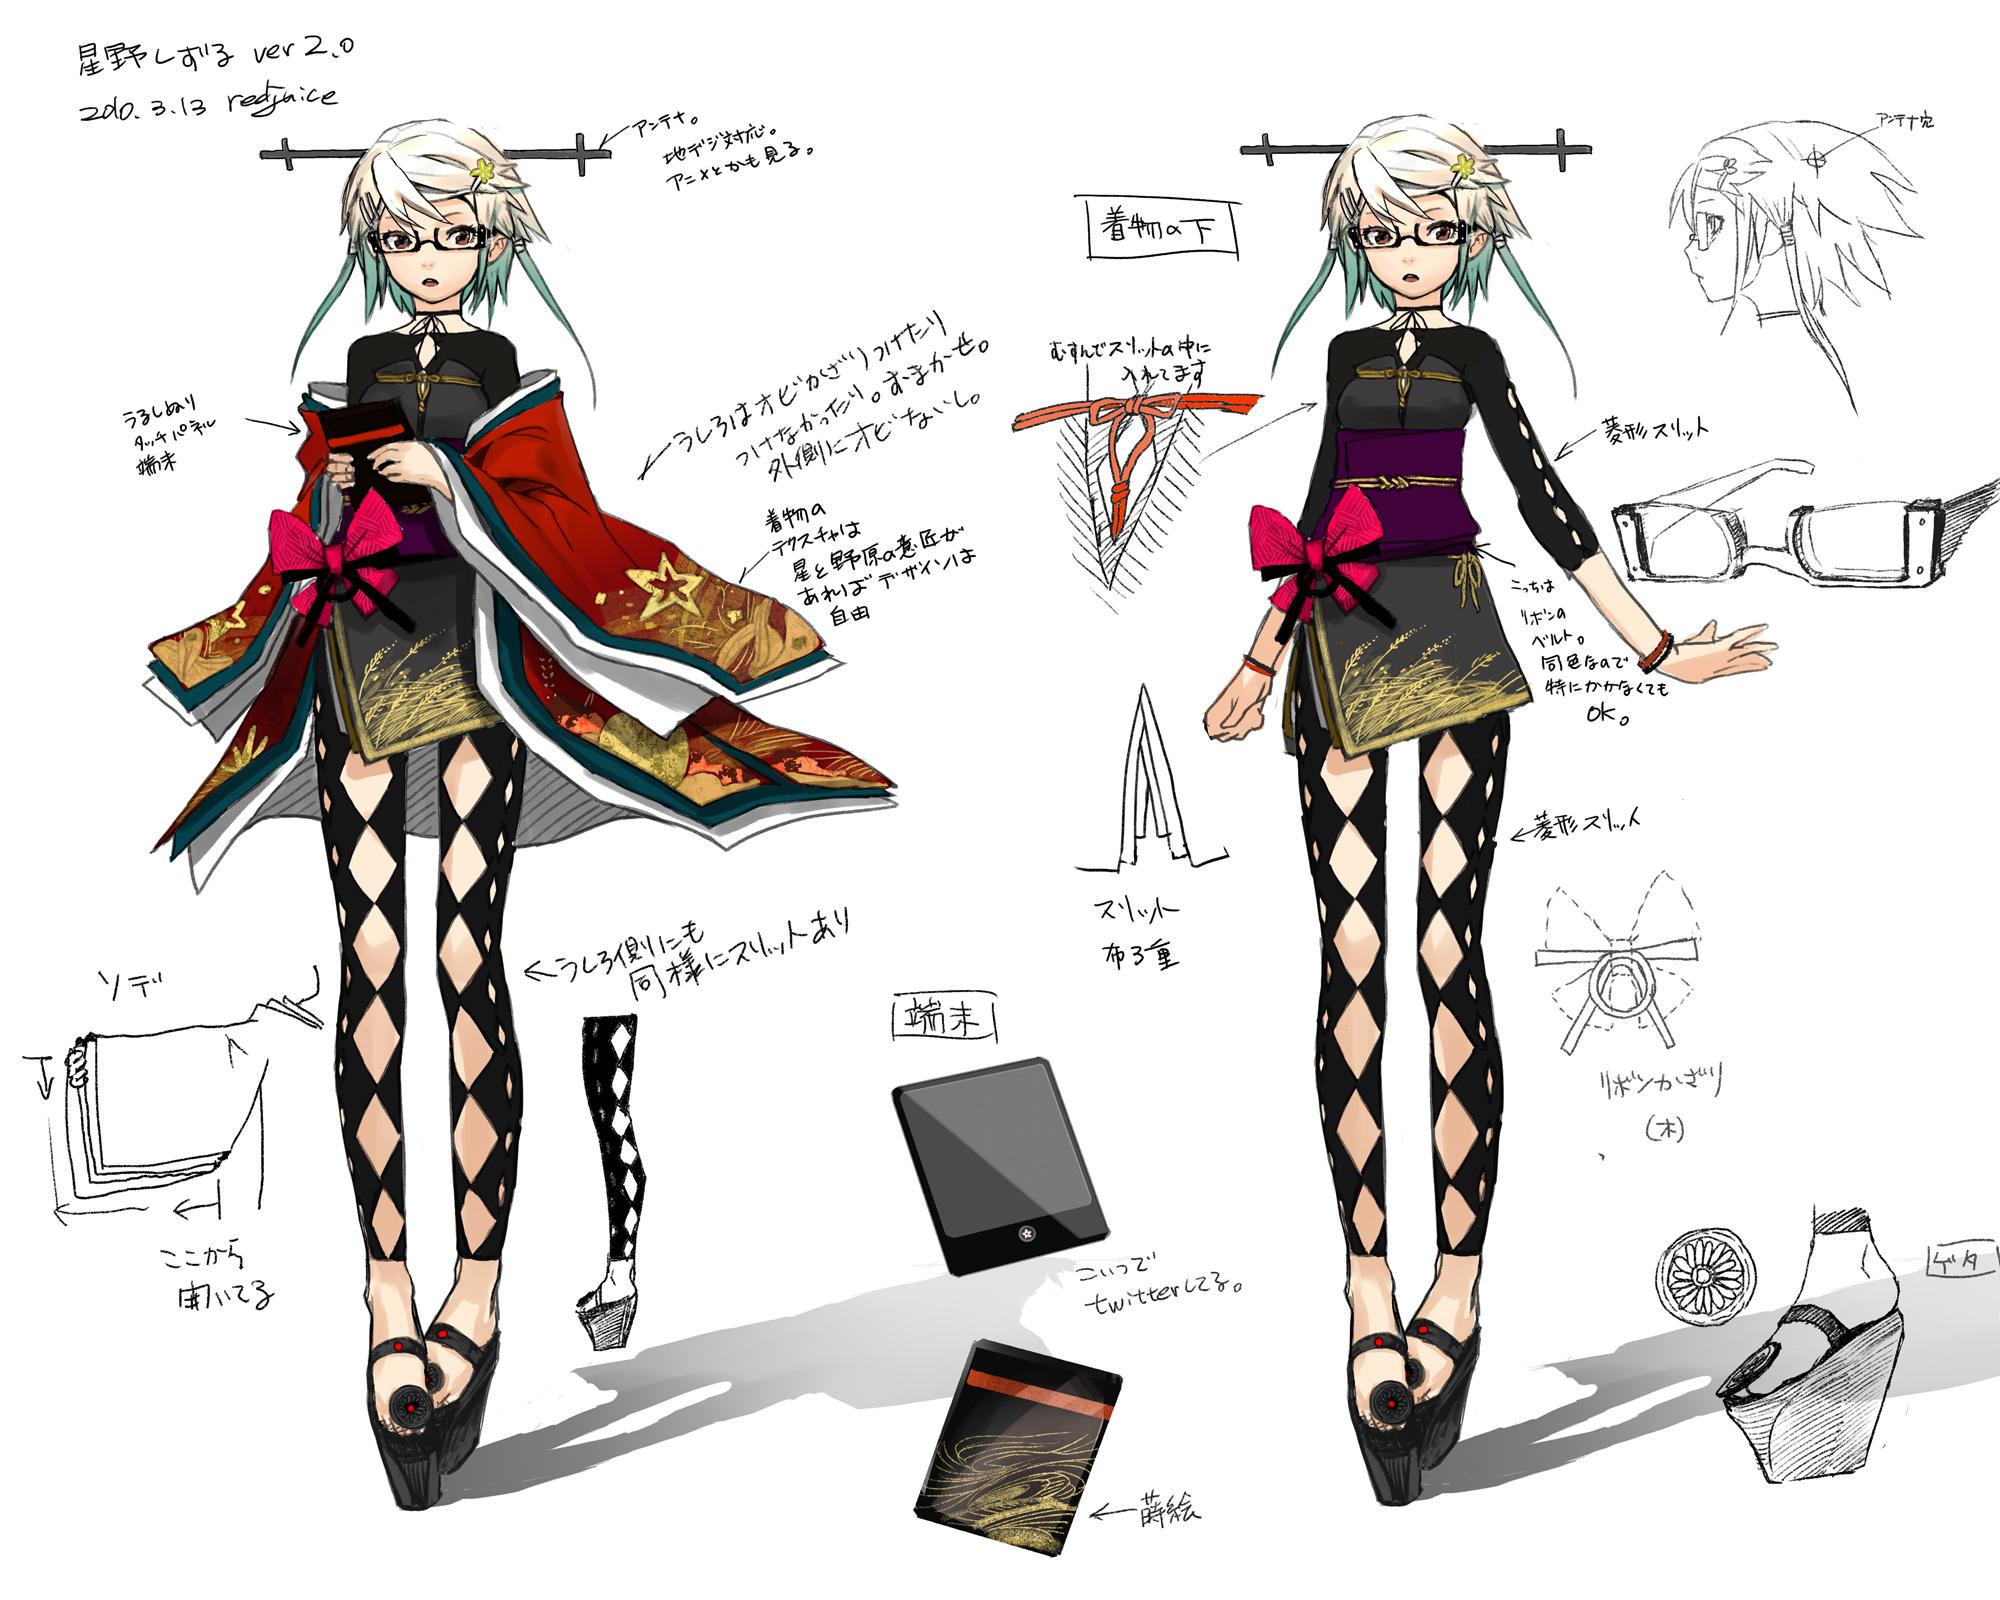 Character Design Zerochan : Hoshino shizuru redjuice image  zerochan